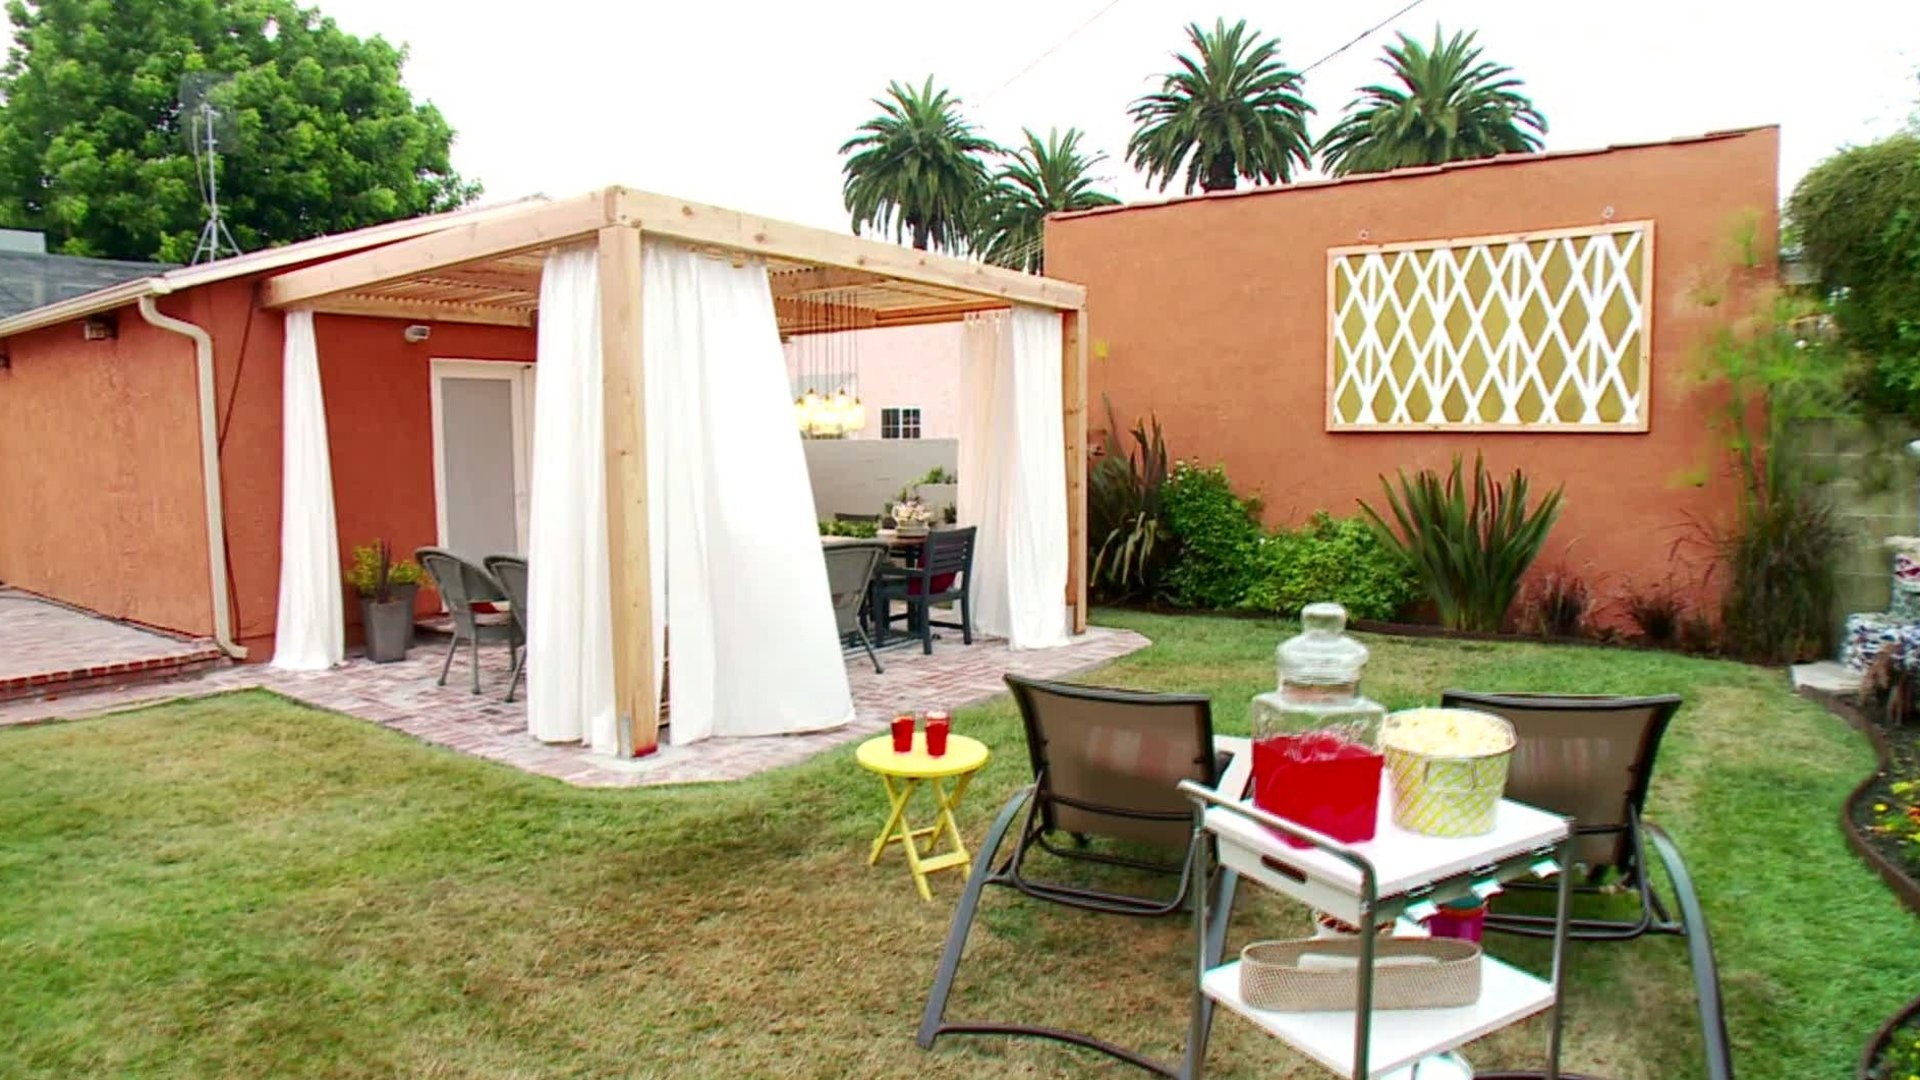 10 Cute Backyard Ideas On A Budget 12 budget friendly backyards diy